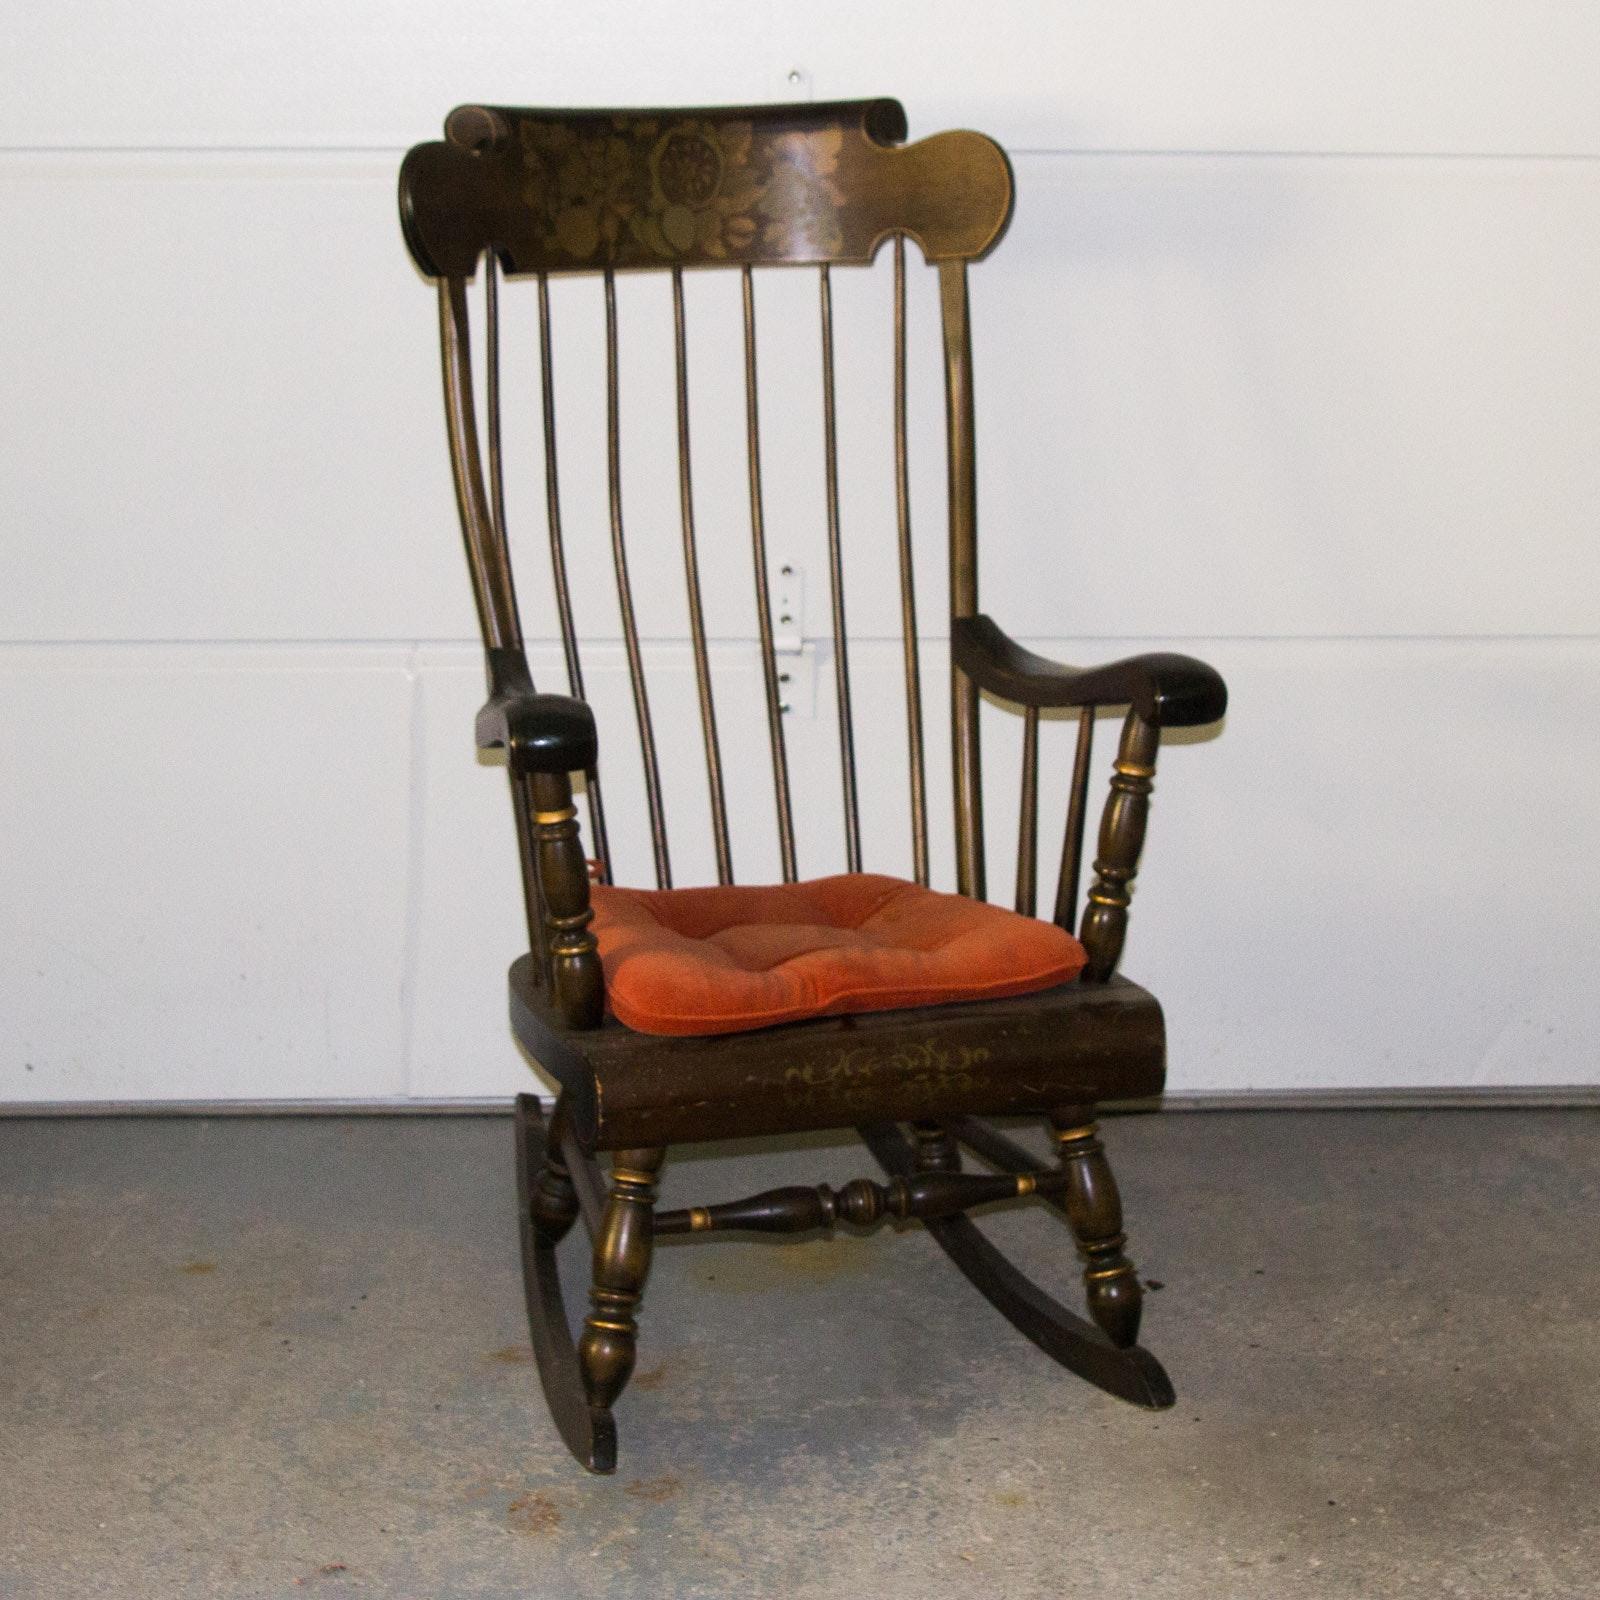 Vintage Wooden Rocking Chair ...